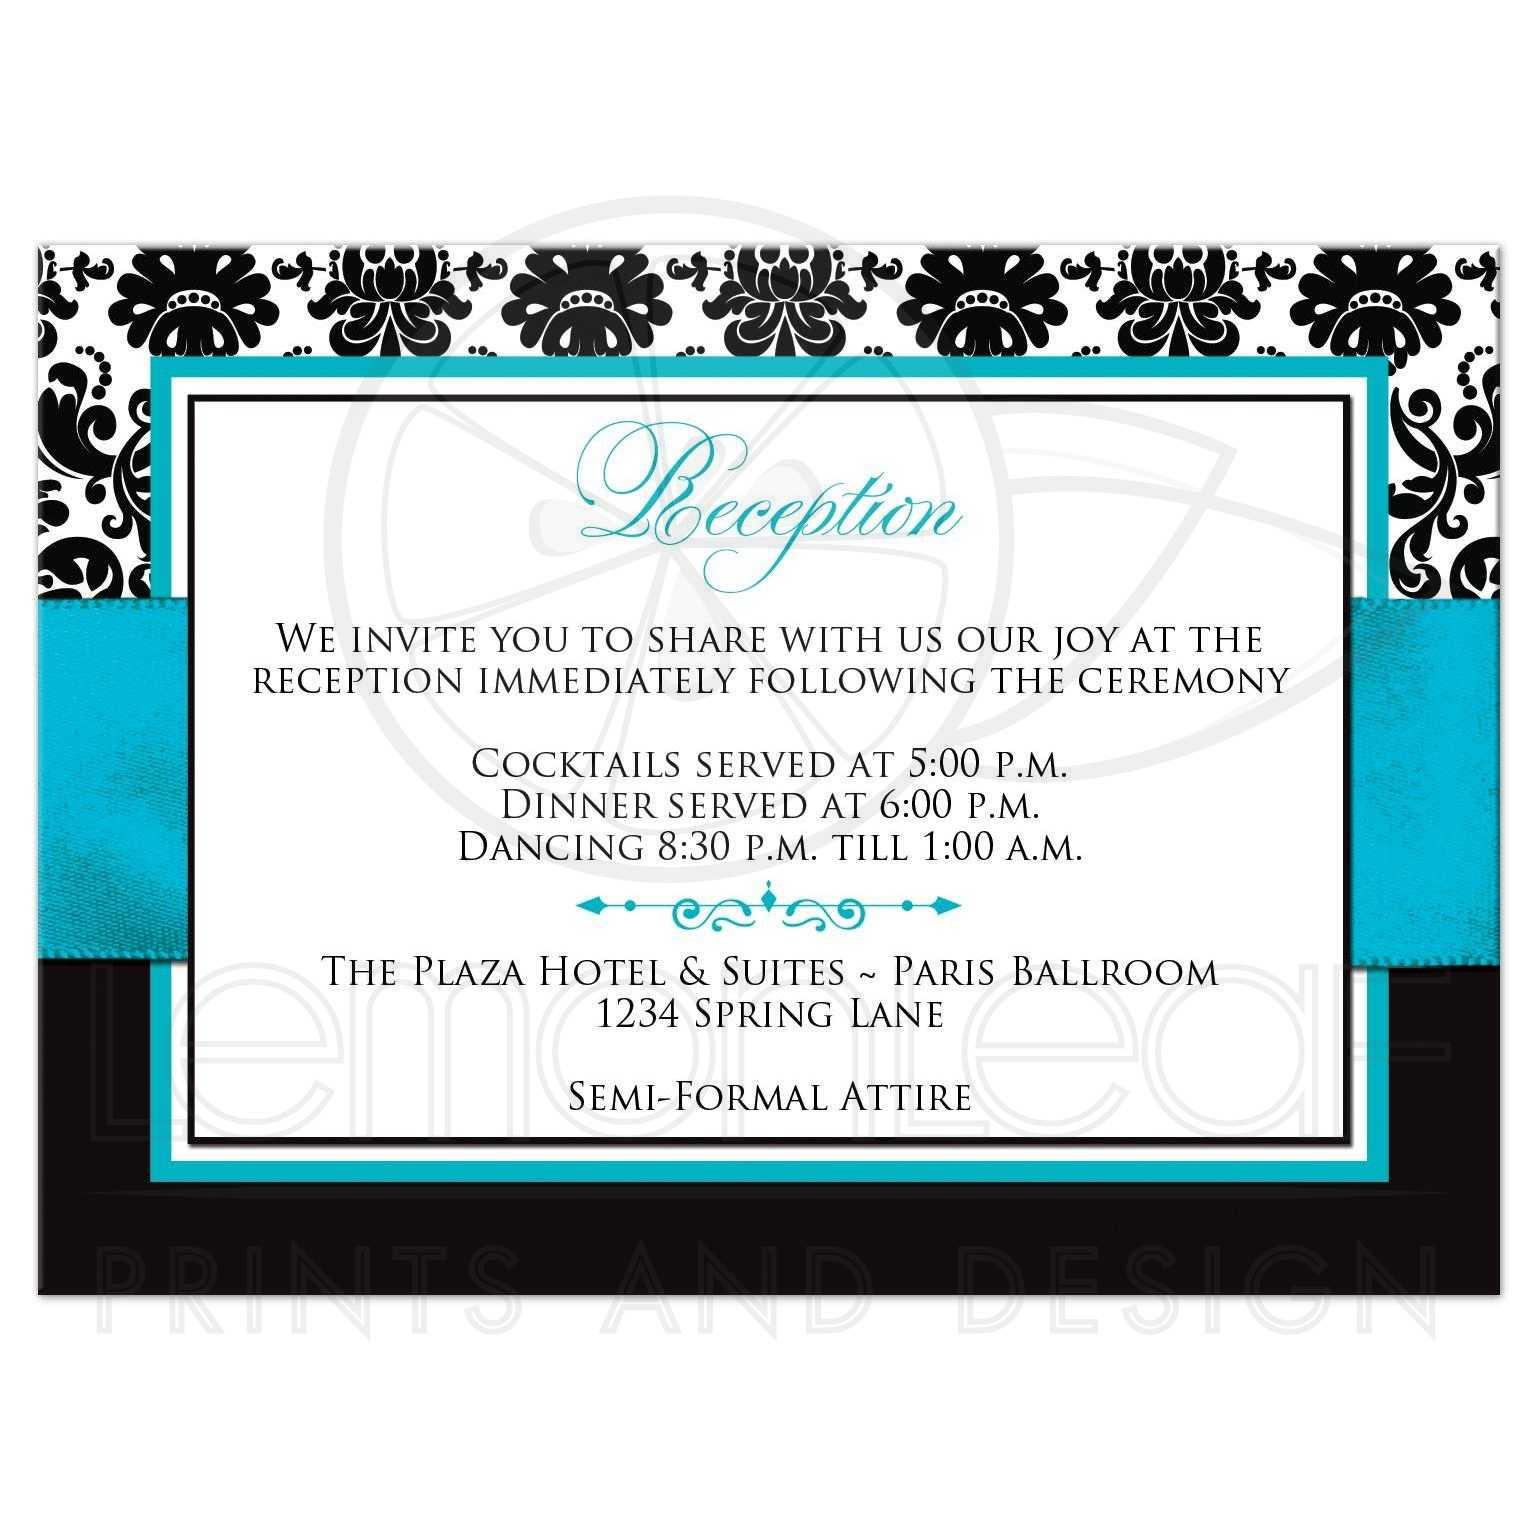 Wedding Reception Enclosure Card 2 | Black and White Damask | PRINTED  Turquoise Ribbon